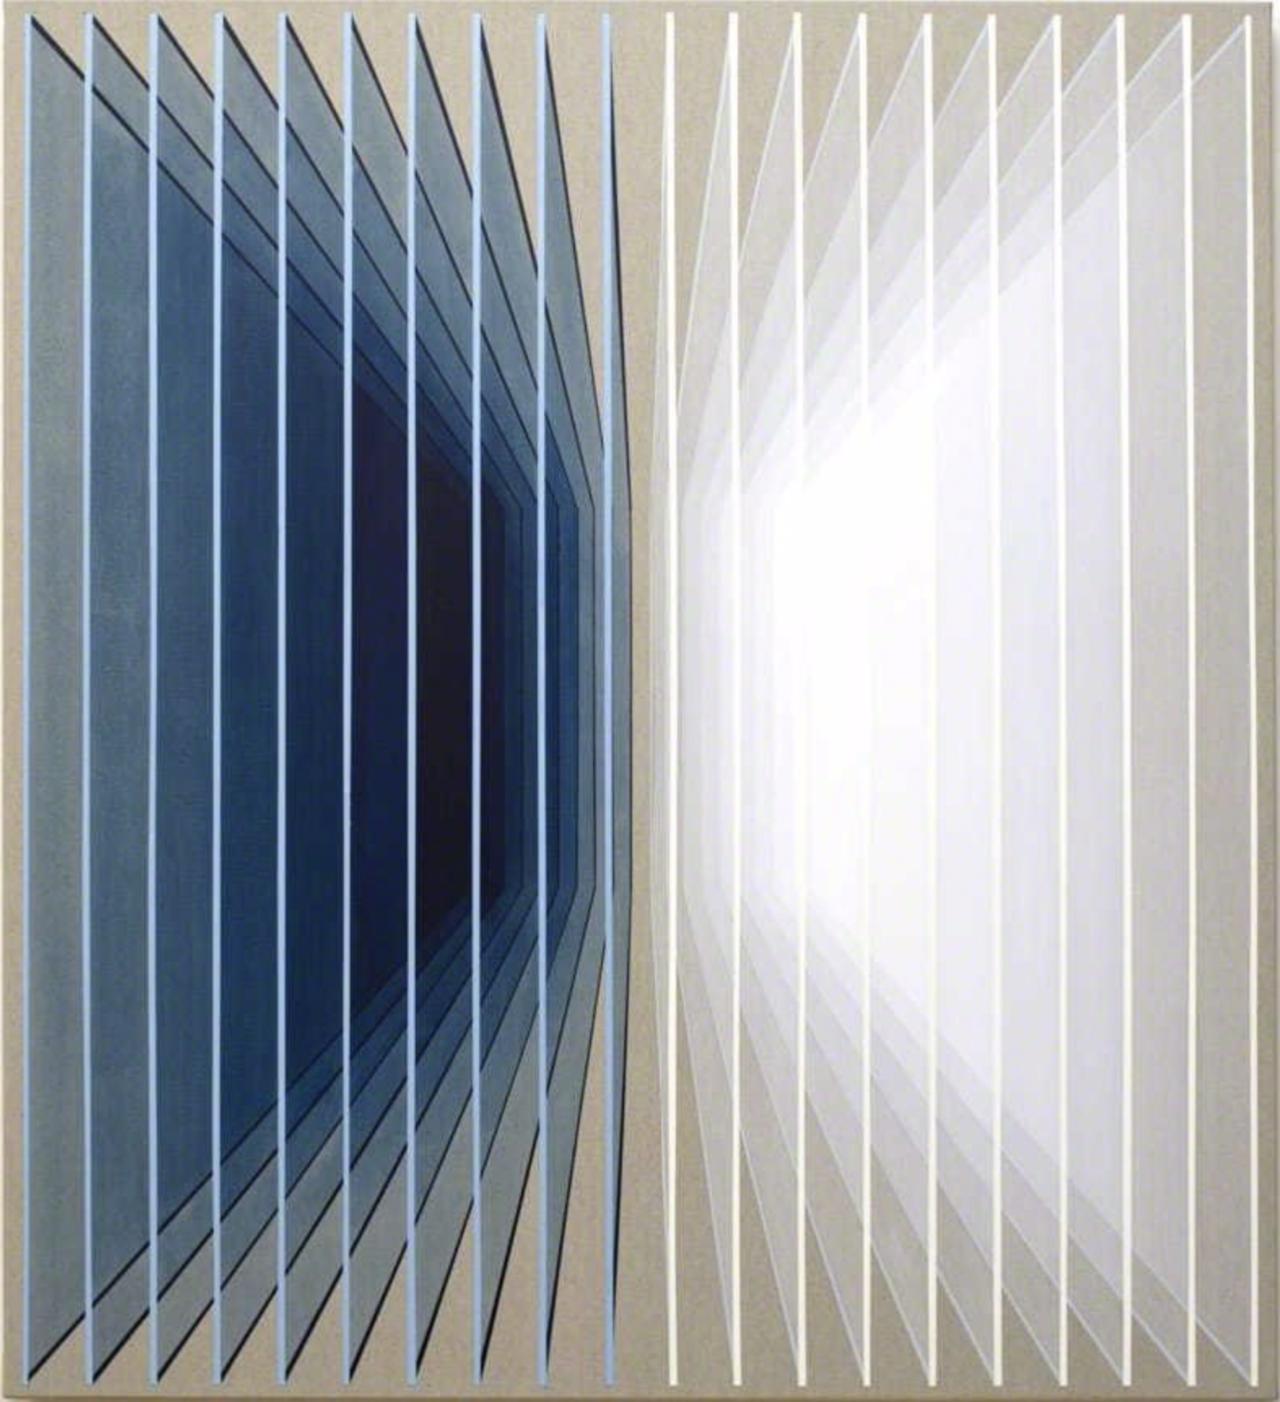 Daniel Mullen, 90's-00's, 2019, Acrylic on canvas, 110 x 100 cm.